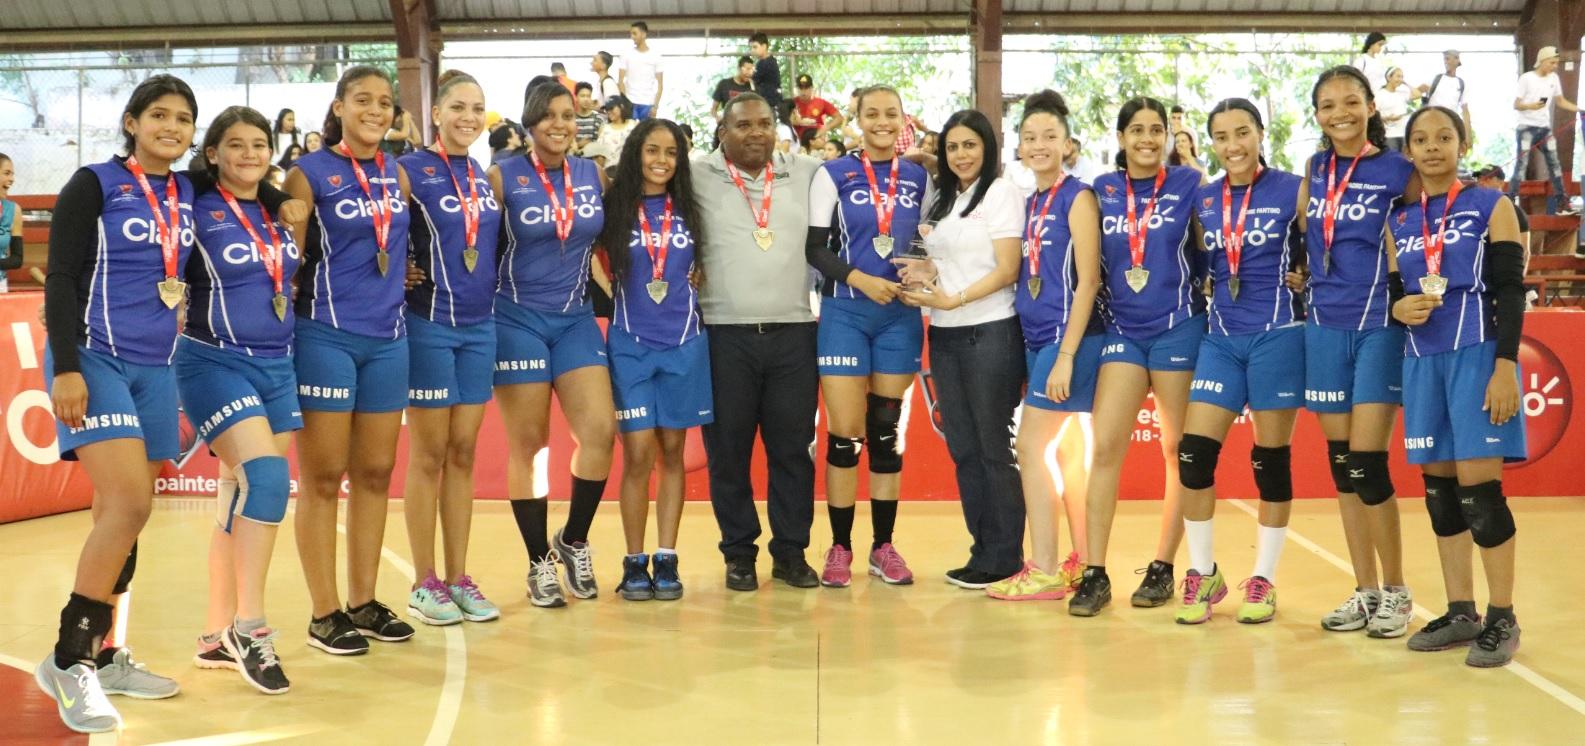 Padre Fantino se coronó campeón etapa Cibao de Copa Intercolegial de Voleibol Femenino